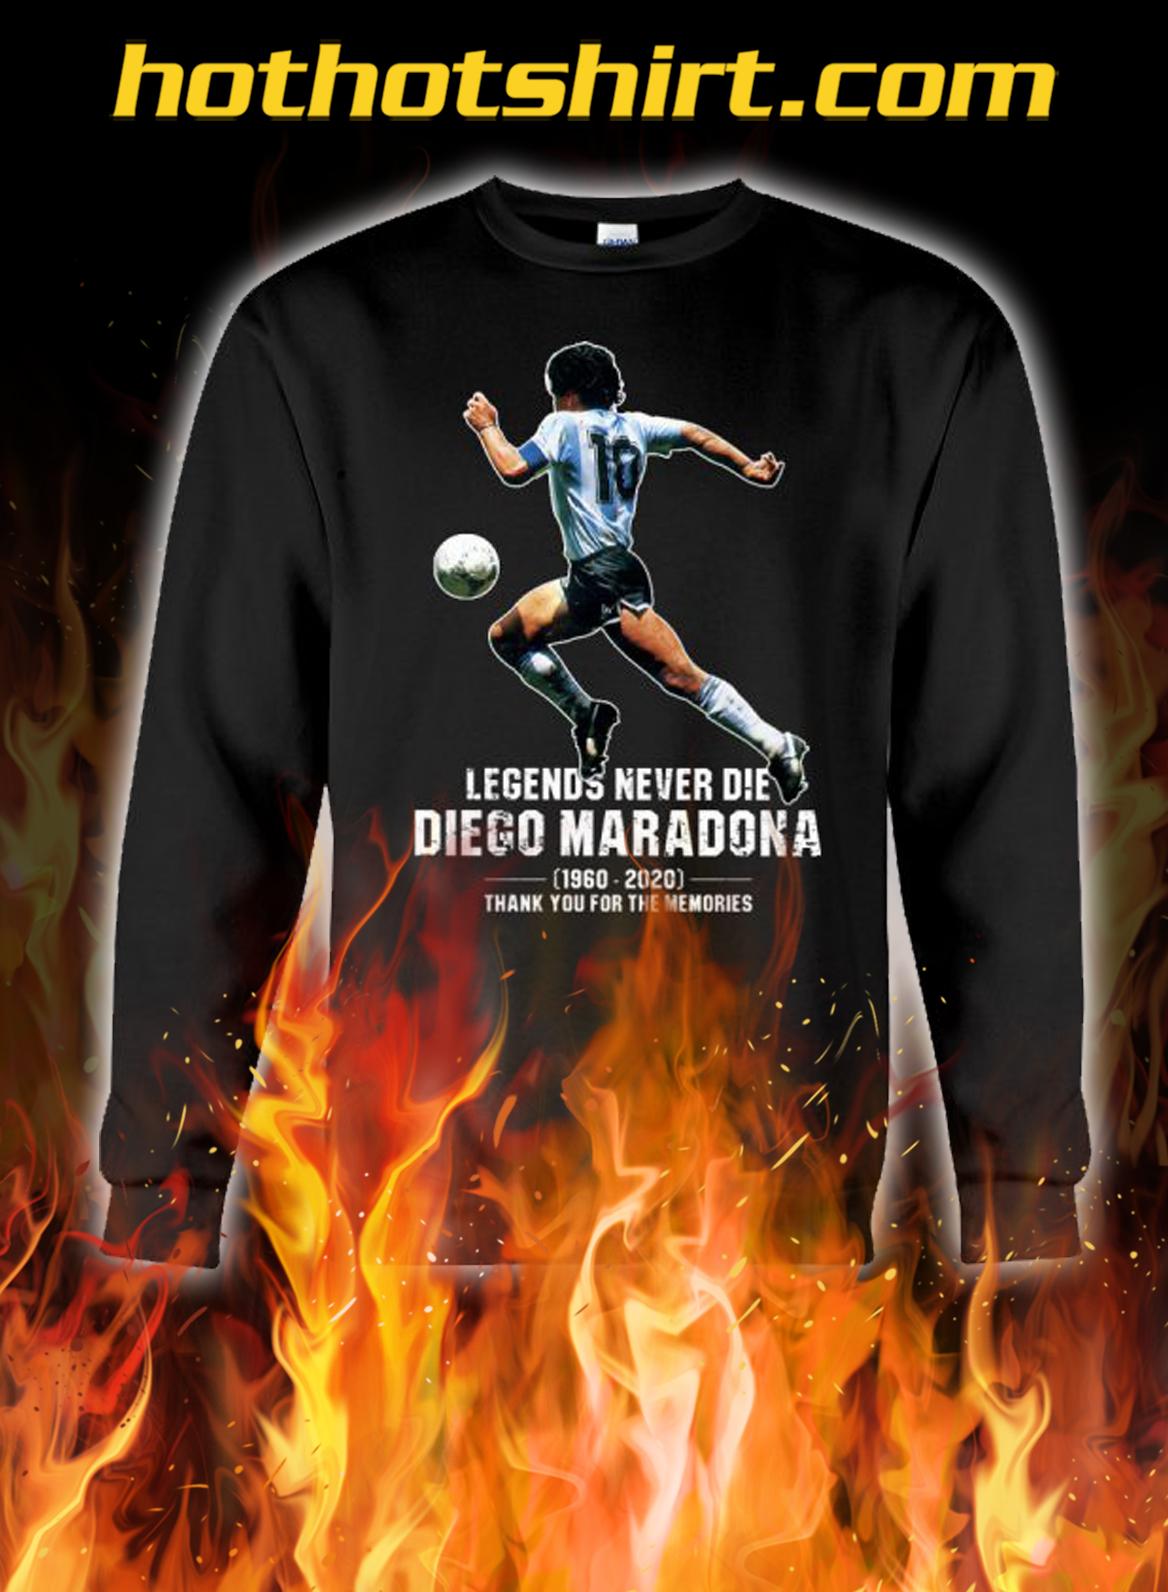 Legends never die Diego Maradona Thank you for the memories sweatshirt